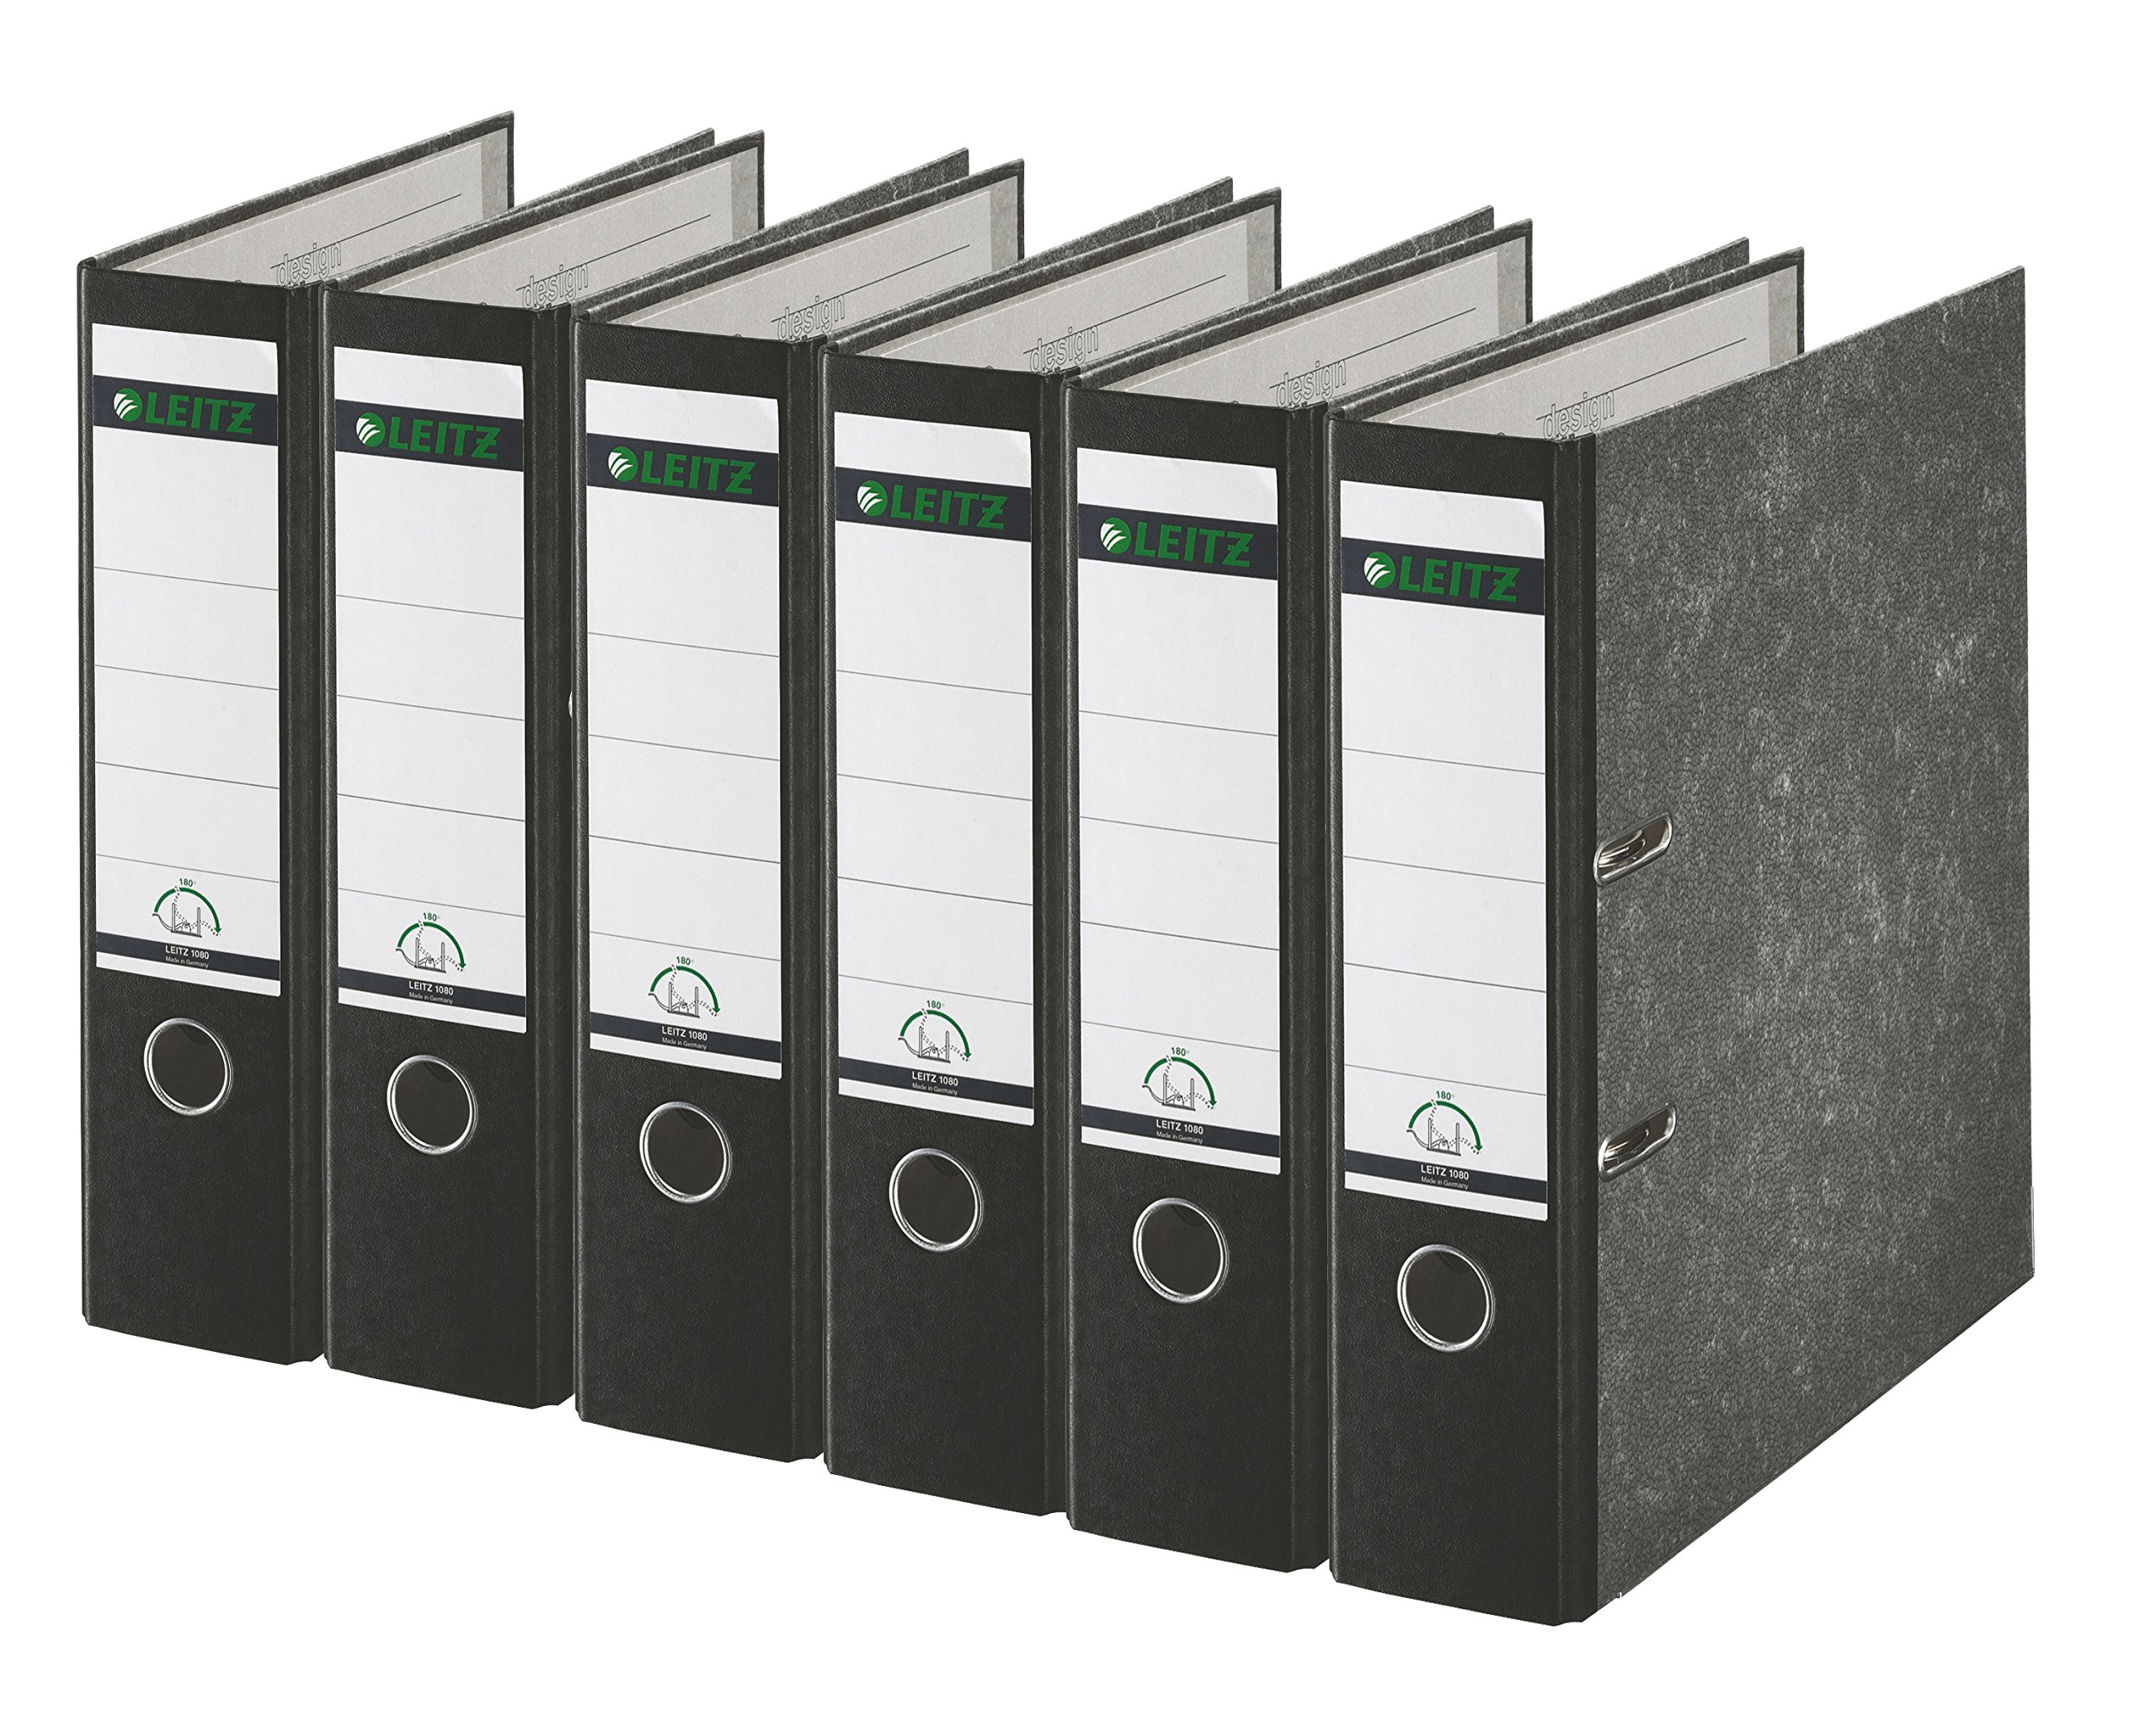 Leitz 2-Ring 3-Inch Premium A4 Sized European Binders 6-Pack, Black (R80PACK)